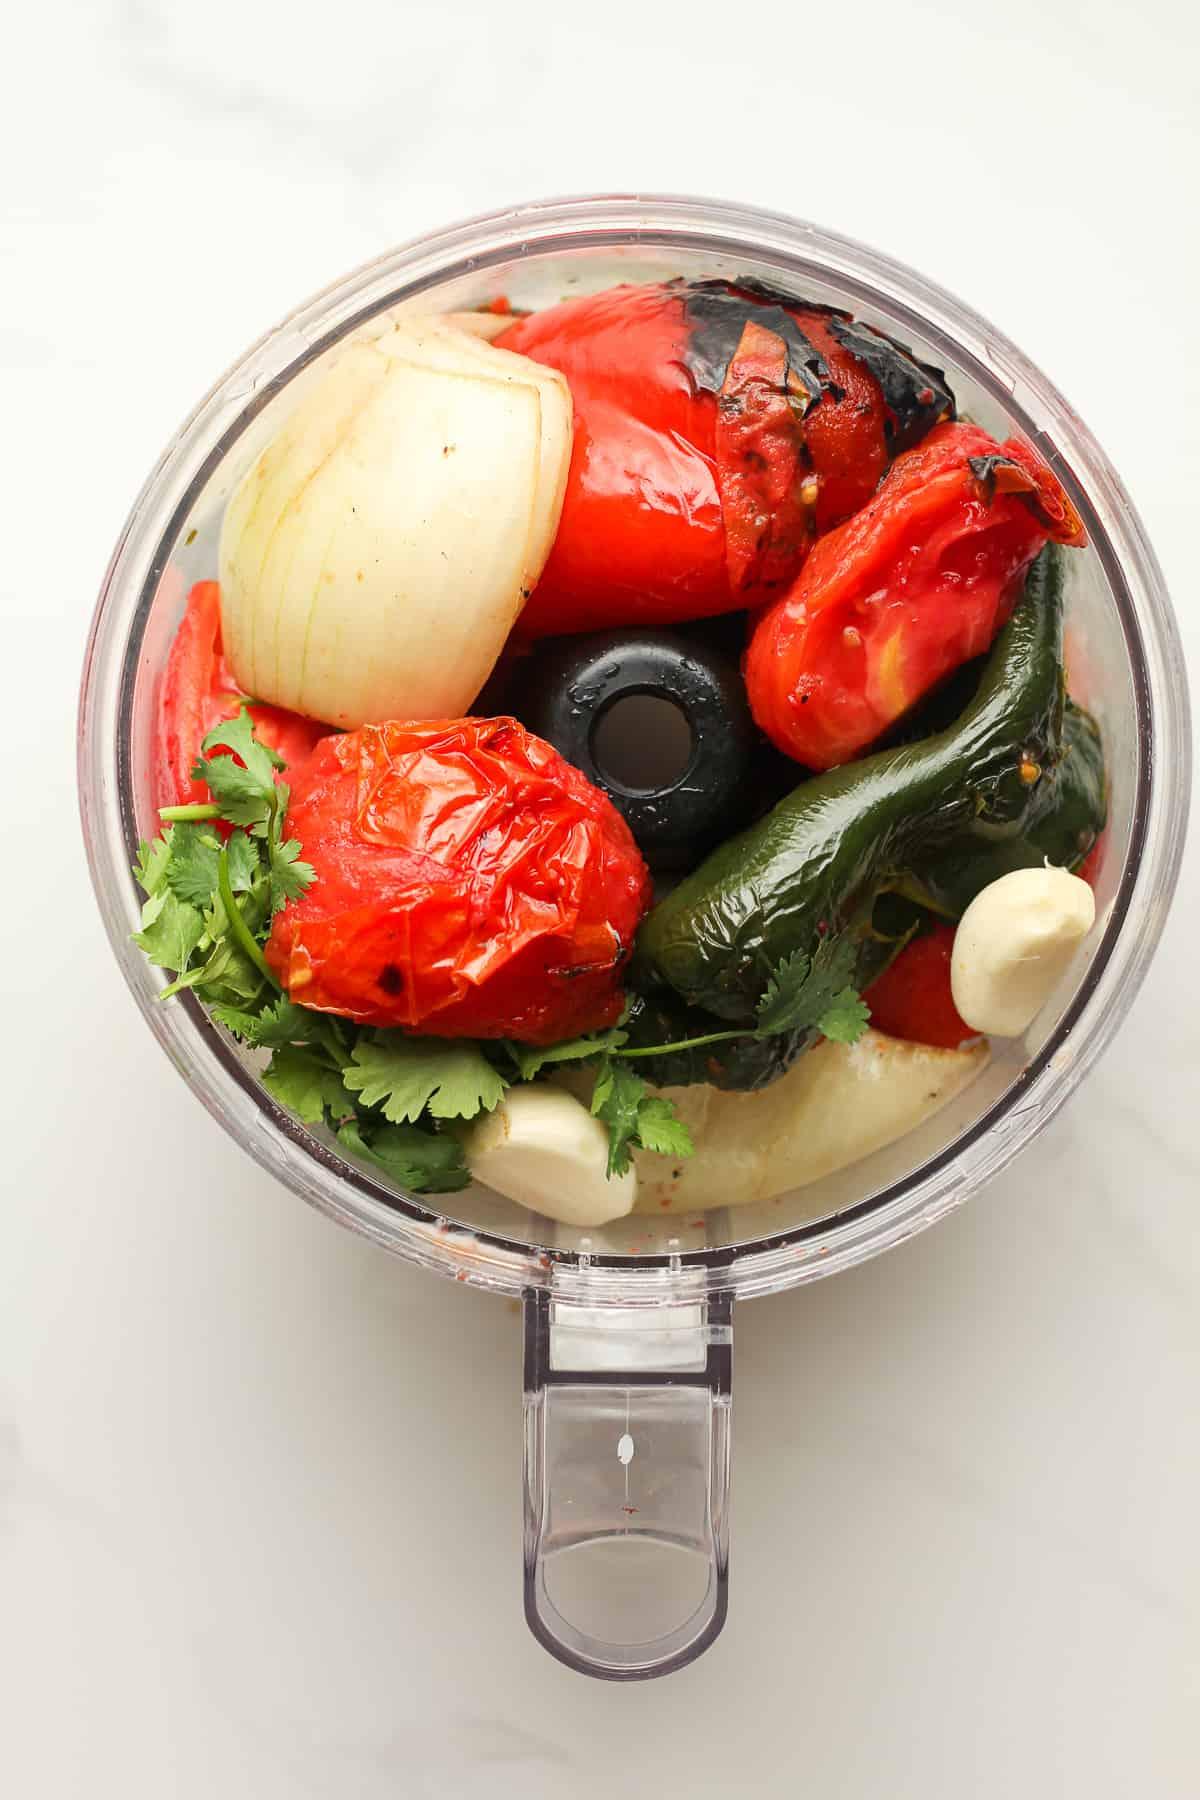 The food processor stuffed full of grilled veggies.